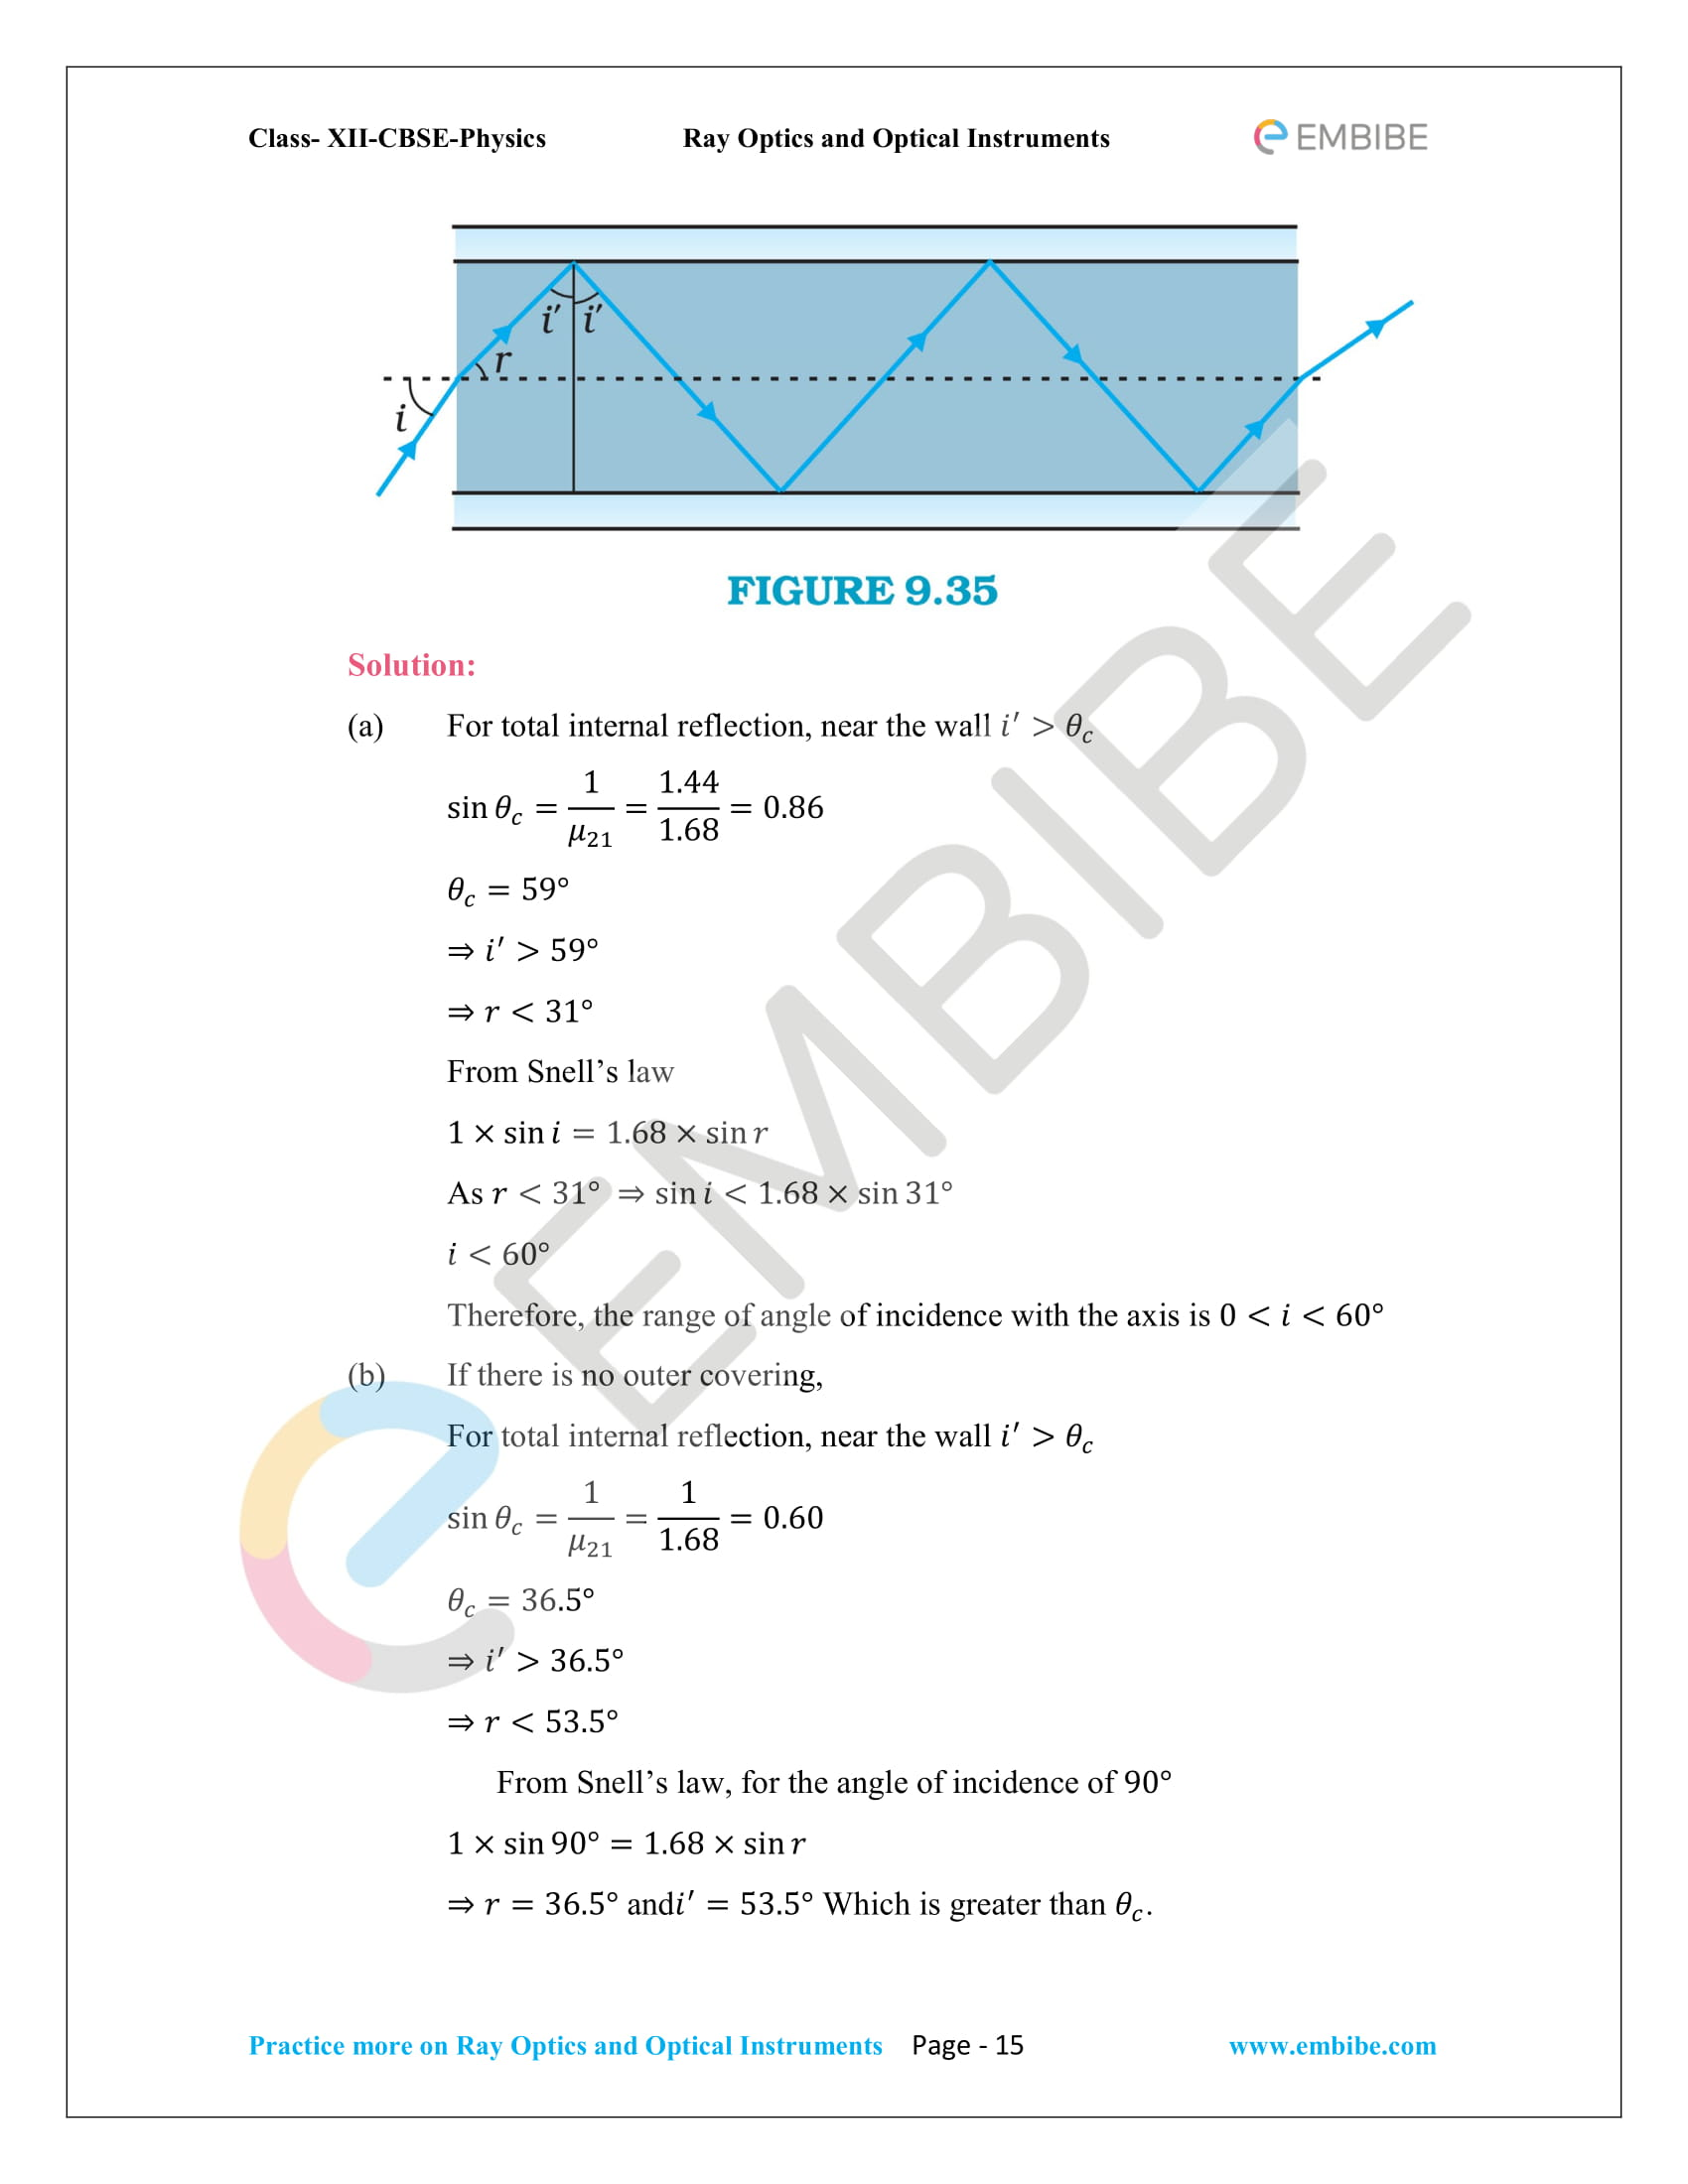 NCERT_Grade 12_Physics_Ch_09_Ray Optics-15